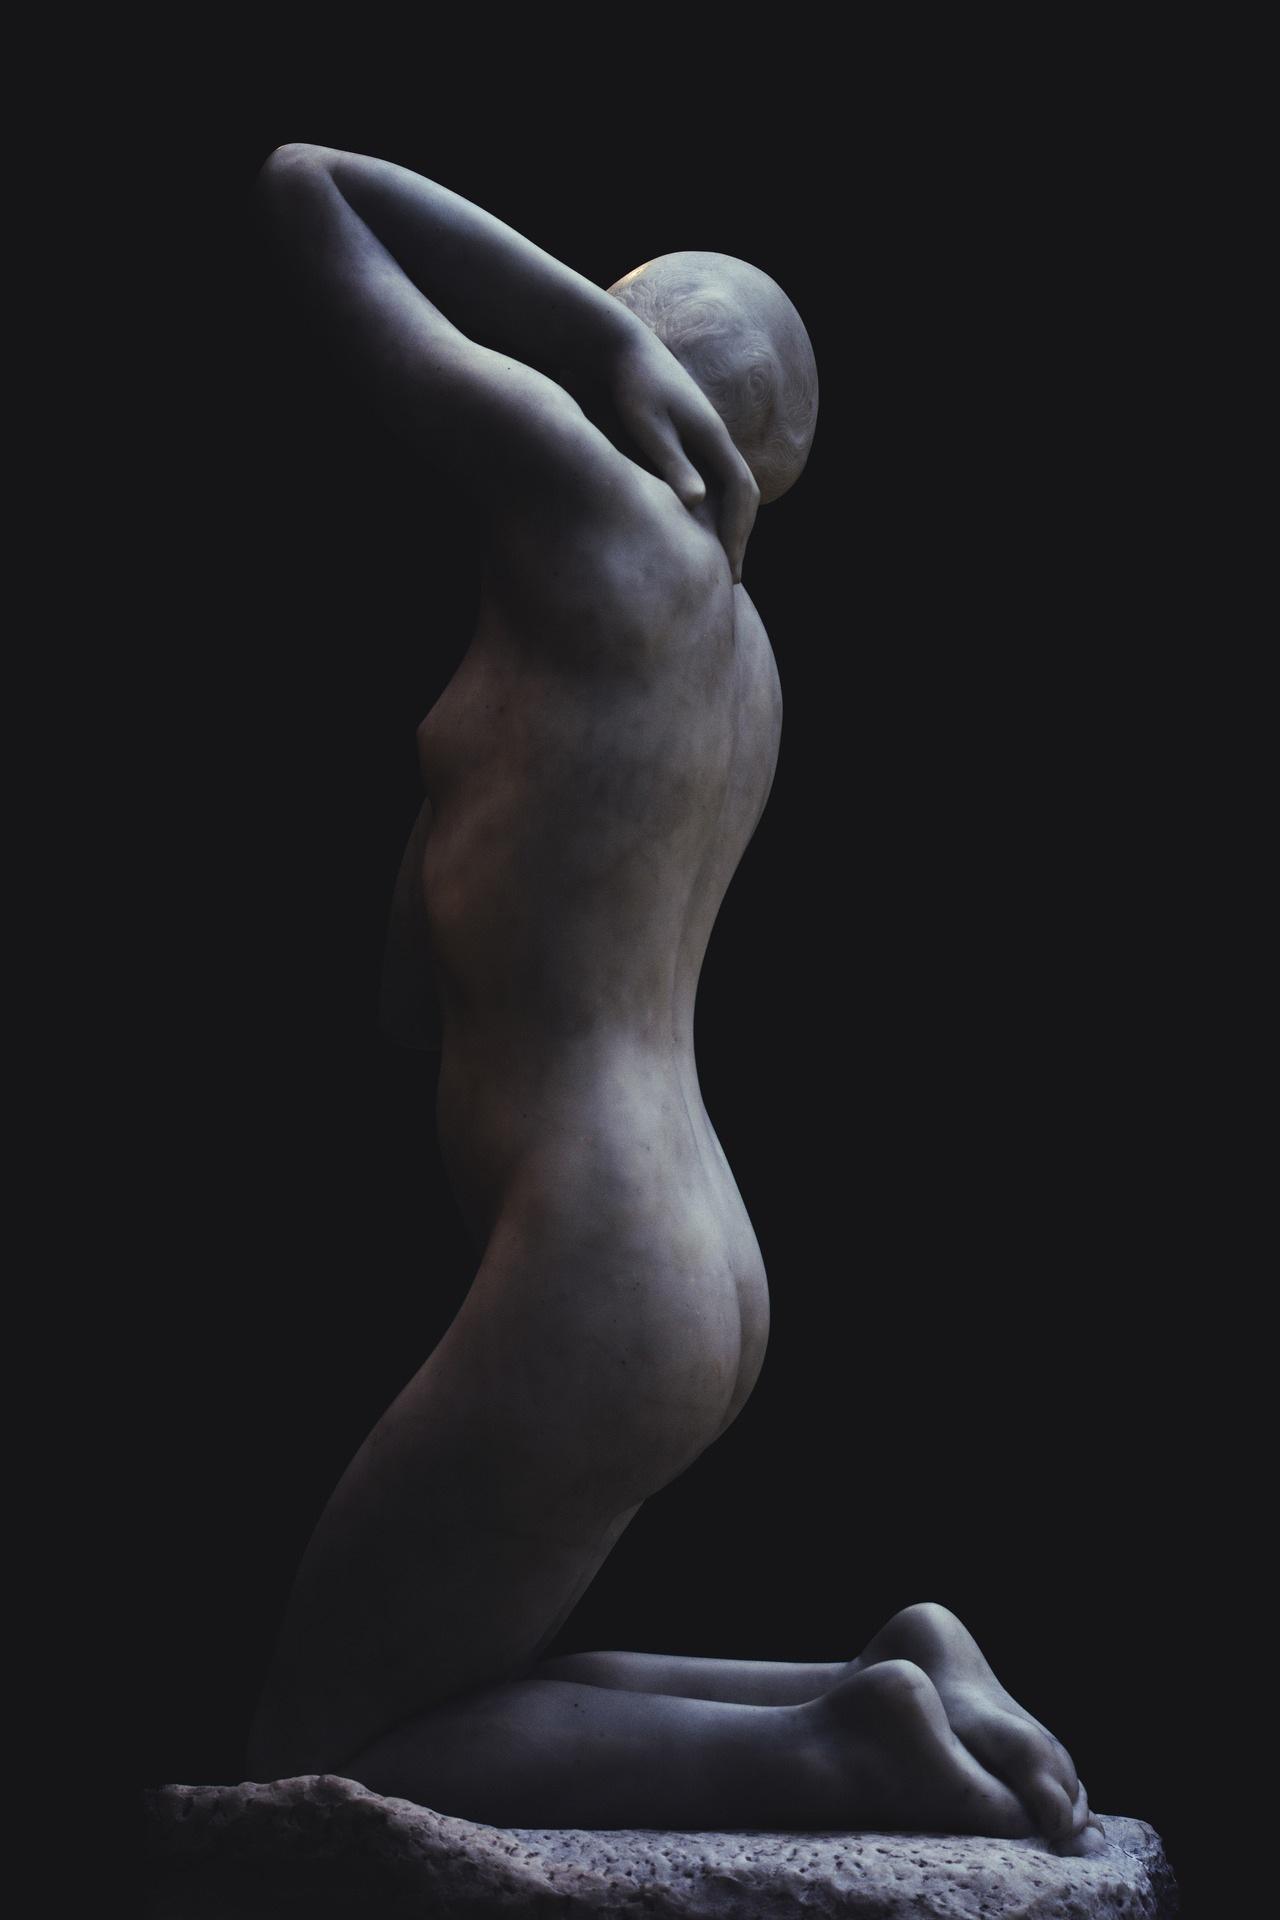 Fragilina-Attilio_Priccirilli-1923-dorianwolf.jpeg